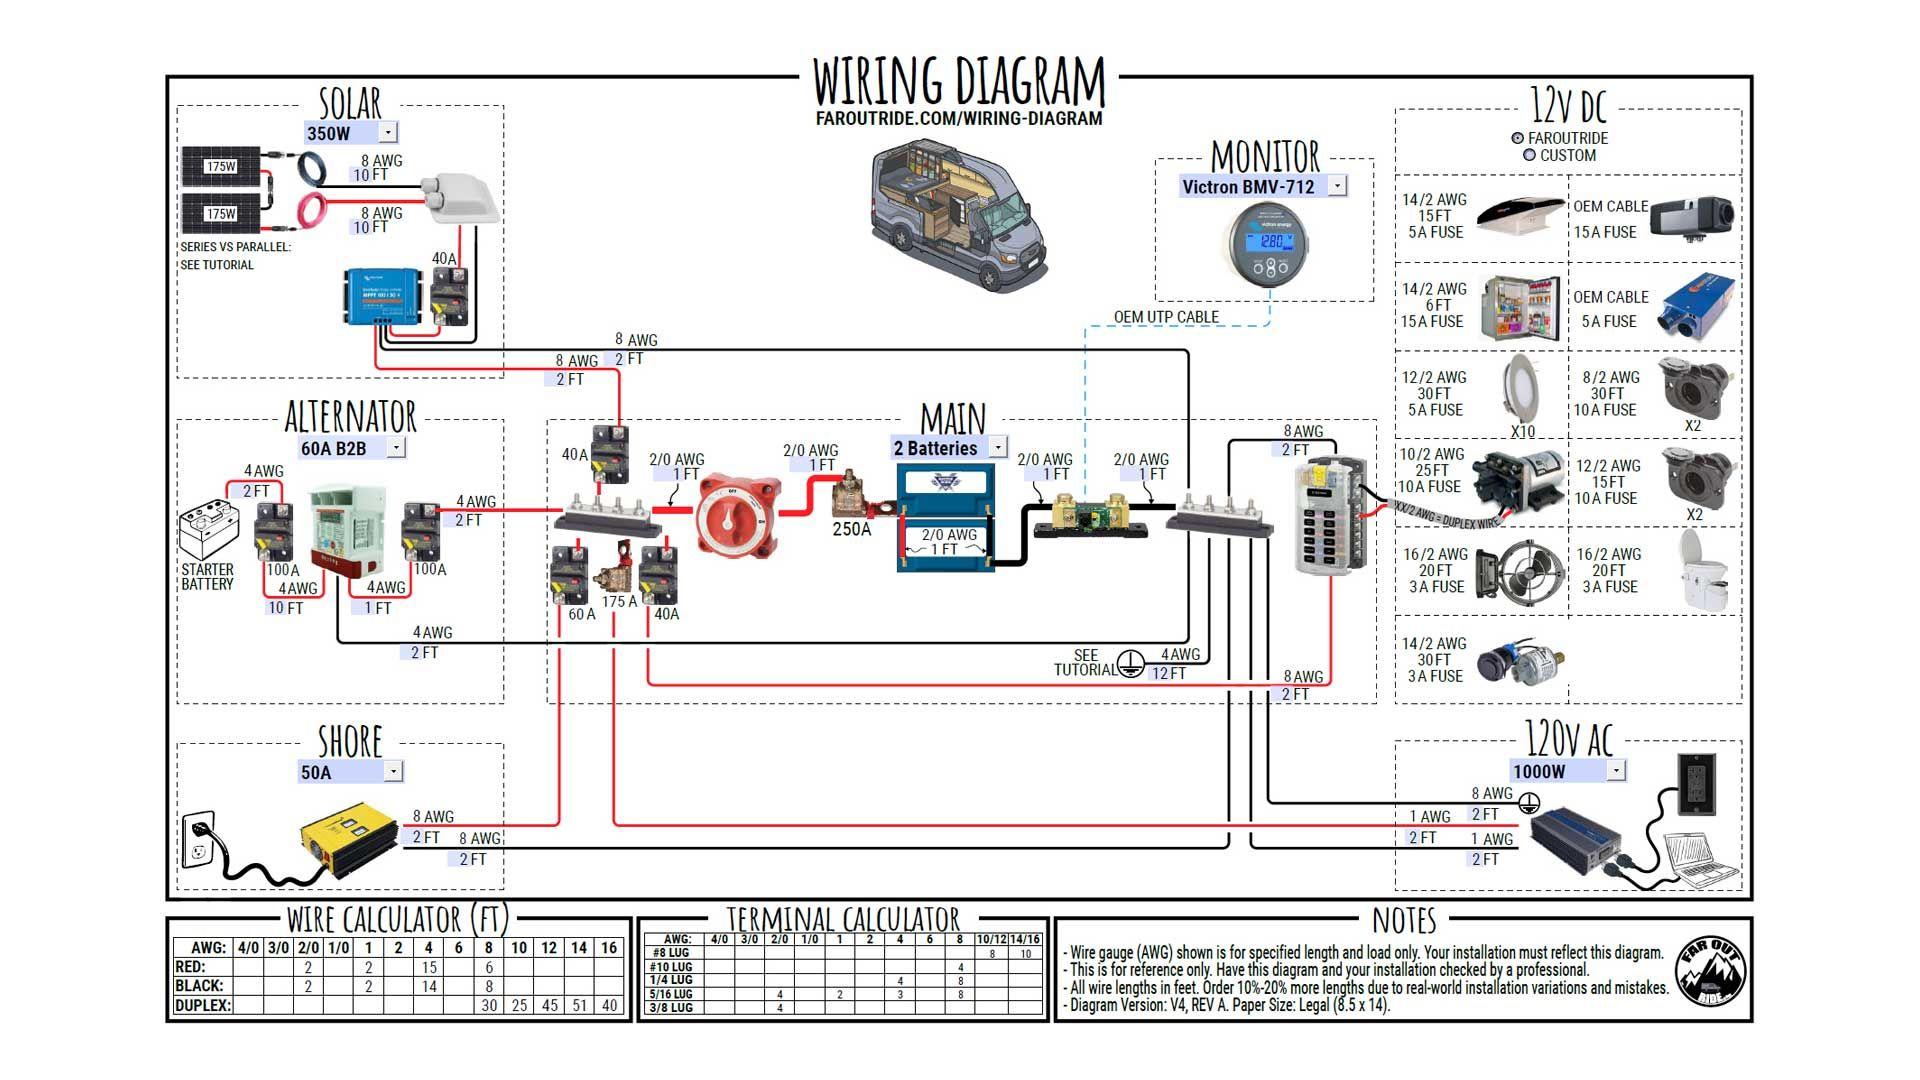 Wiring Diagram Tutorial Pdf